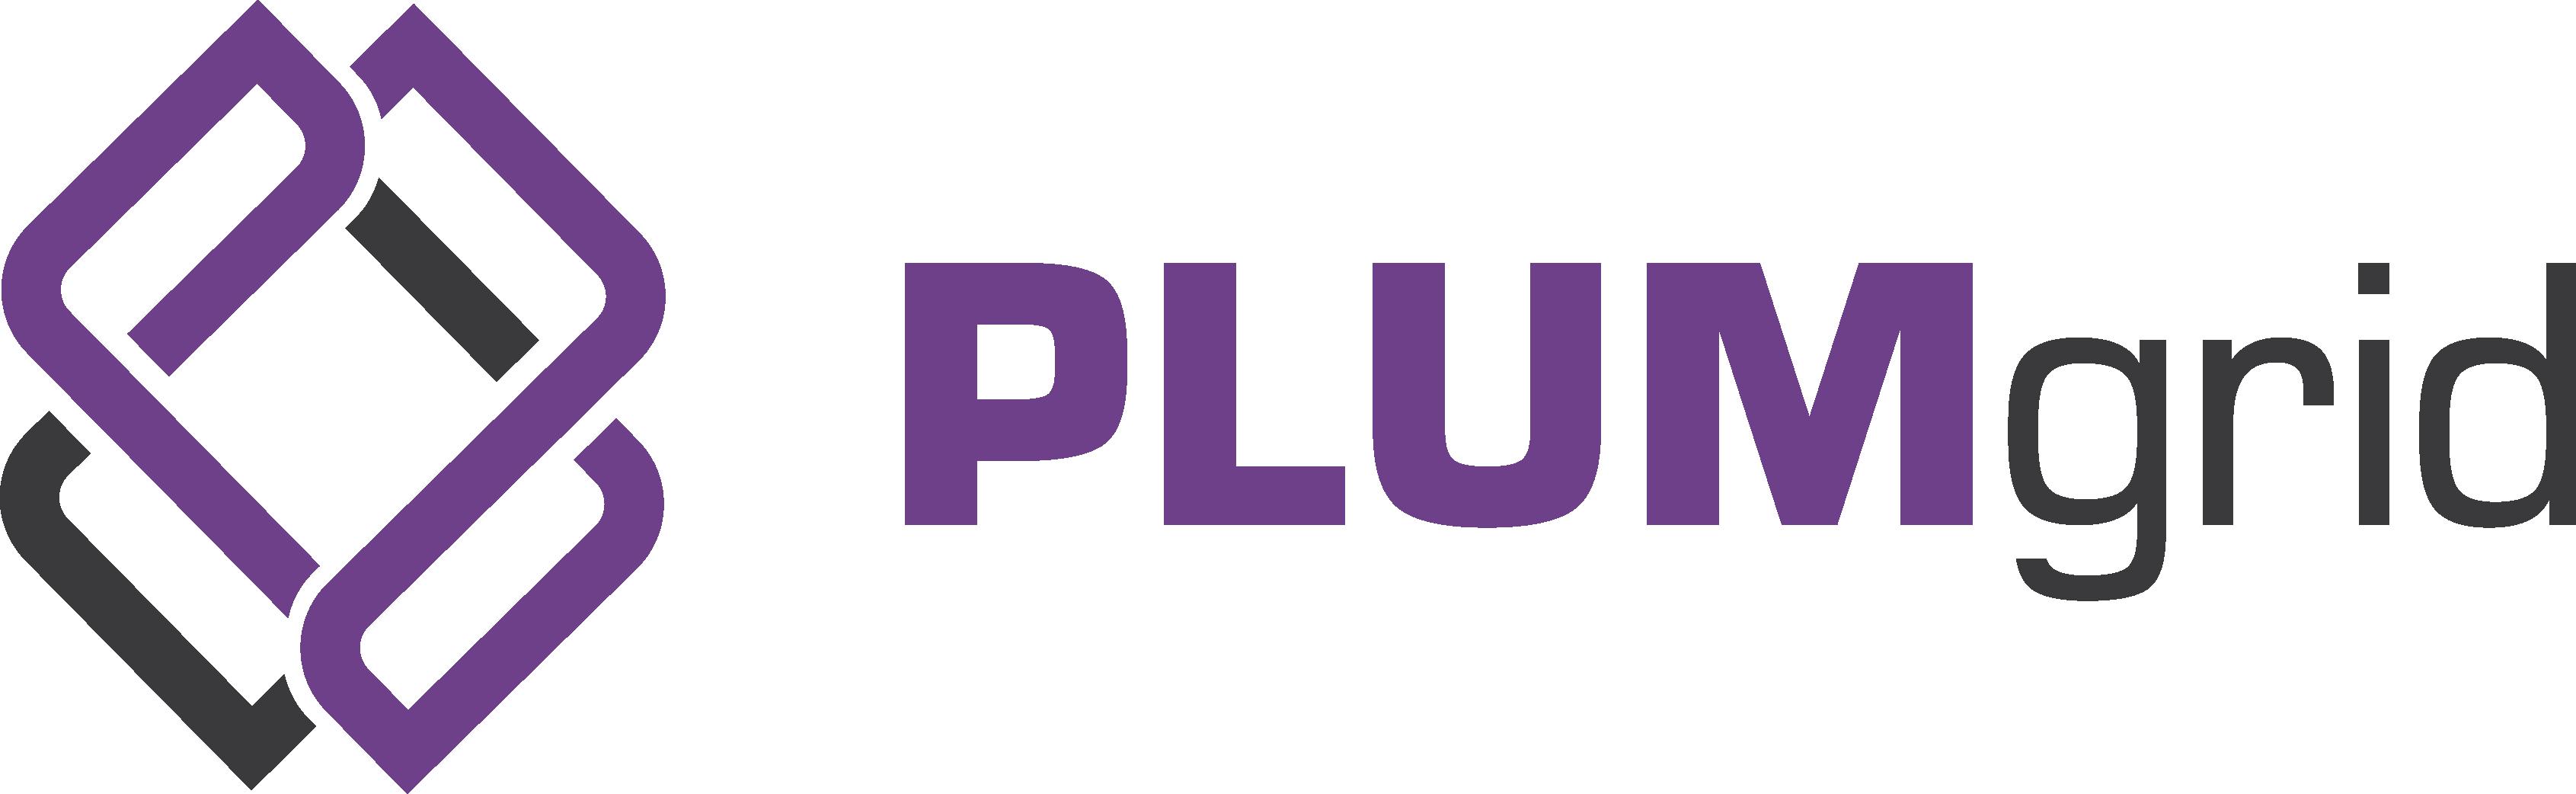 PLUMgrid logo